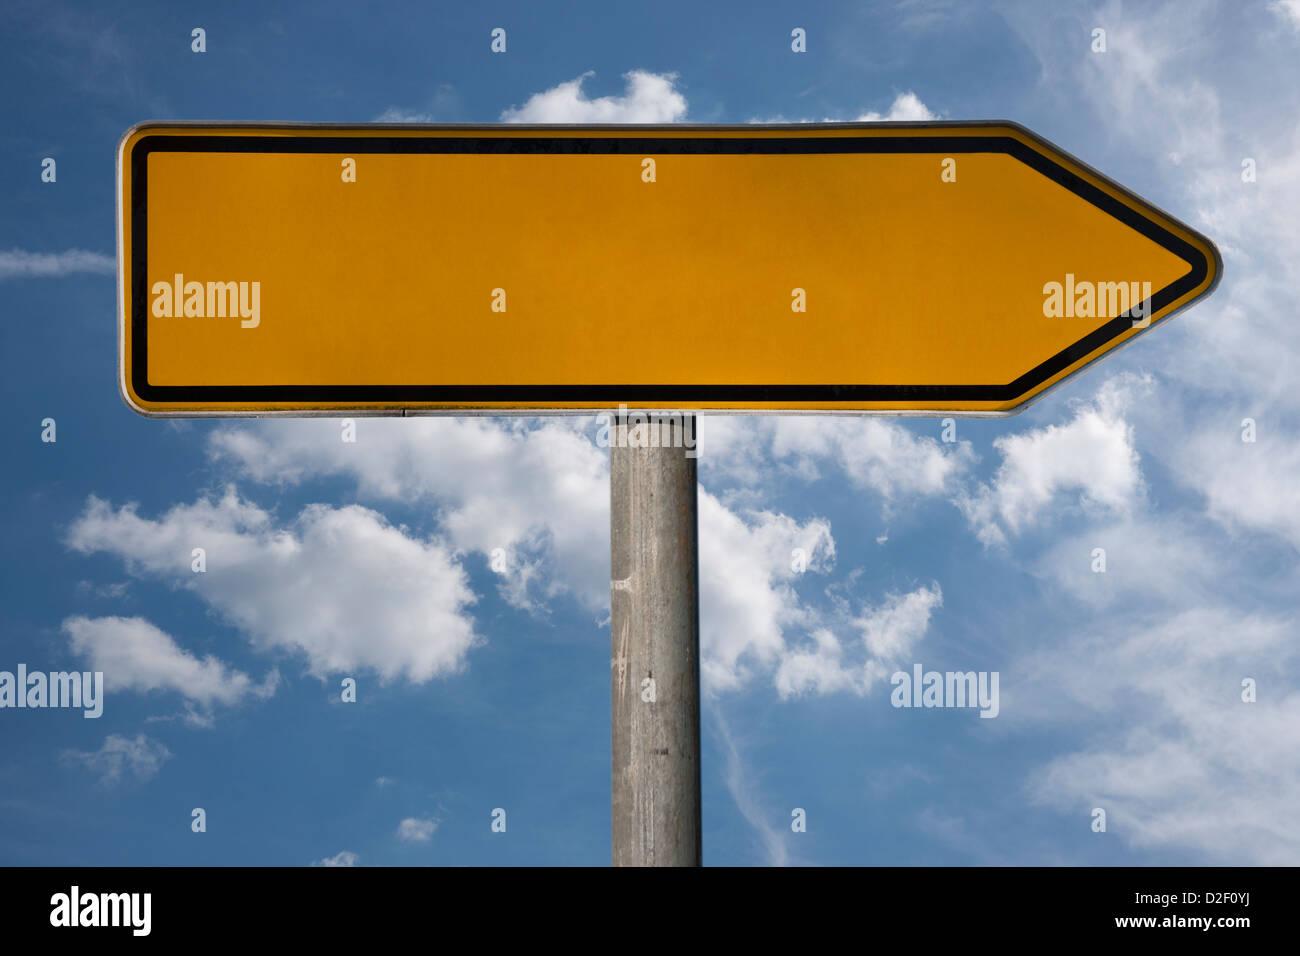 Detailansicht eines Wegweisers ohne Aufschrift | Detail photo of a signpost without a title - Stock Image